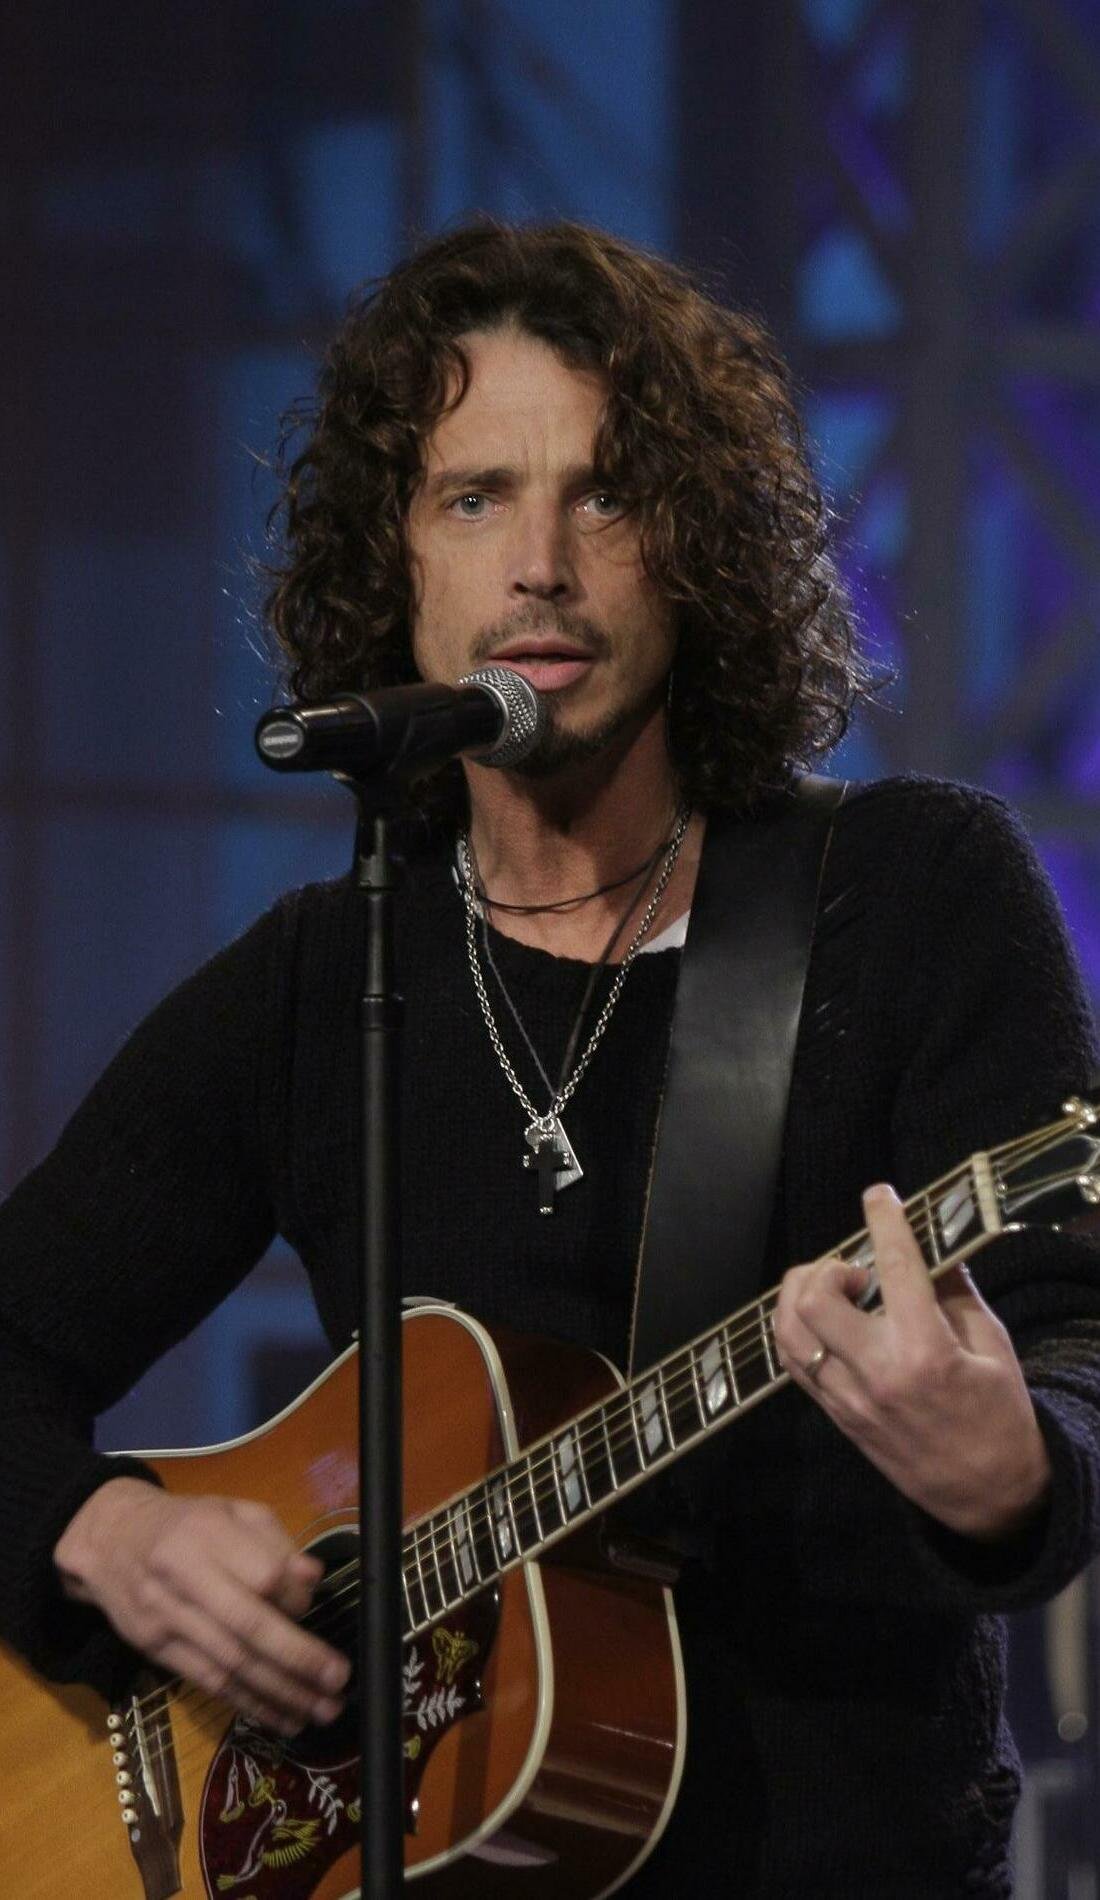 A Chris Cornell live event